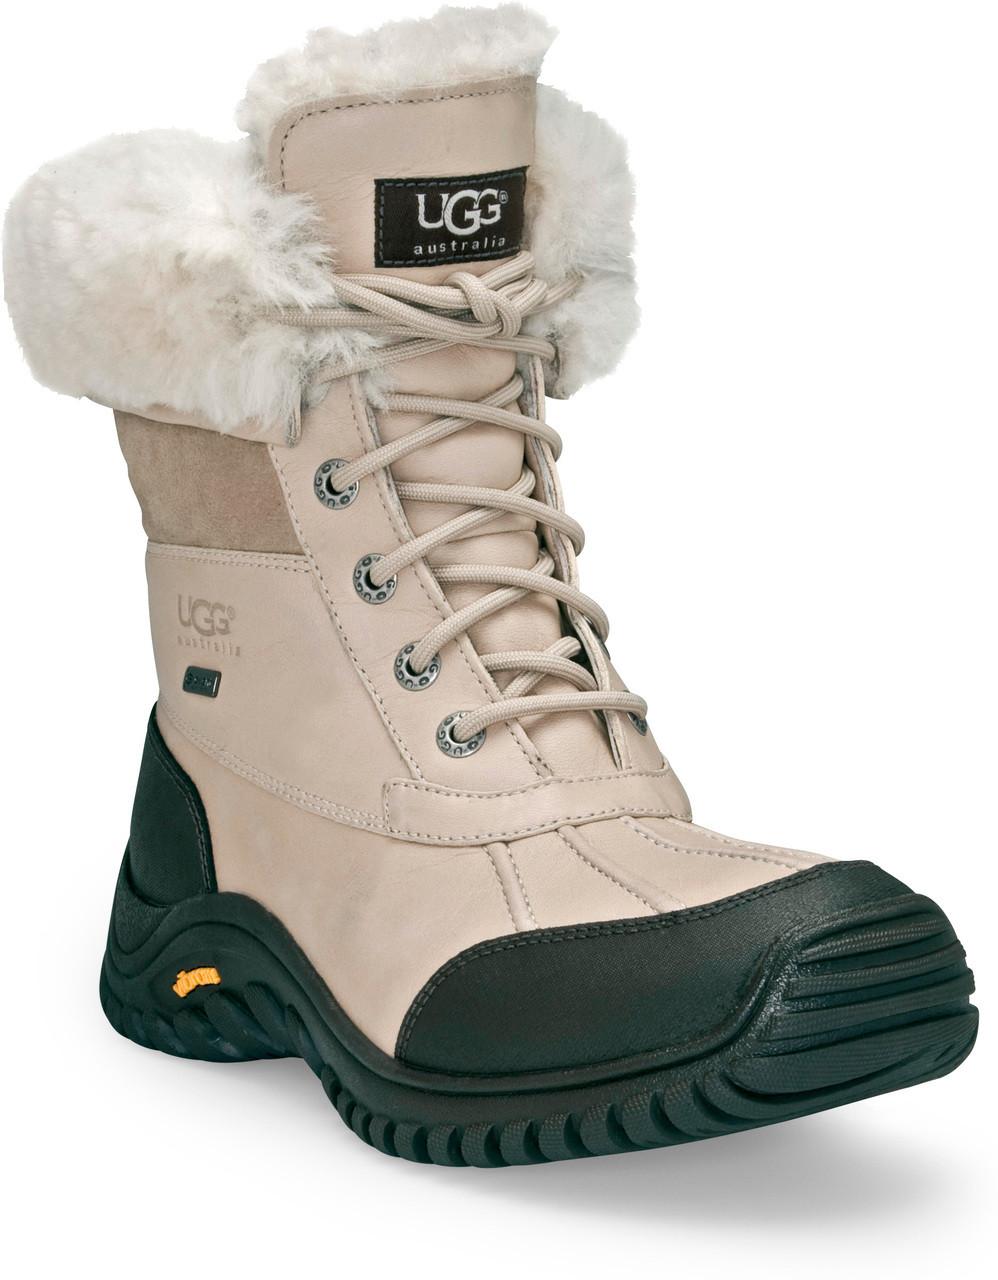 7a783ee0b84 Charmful Ugg Boots Fr Babys Ugg Boots Fr Babys American Go ...